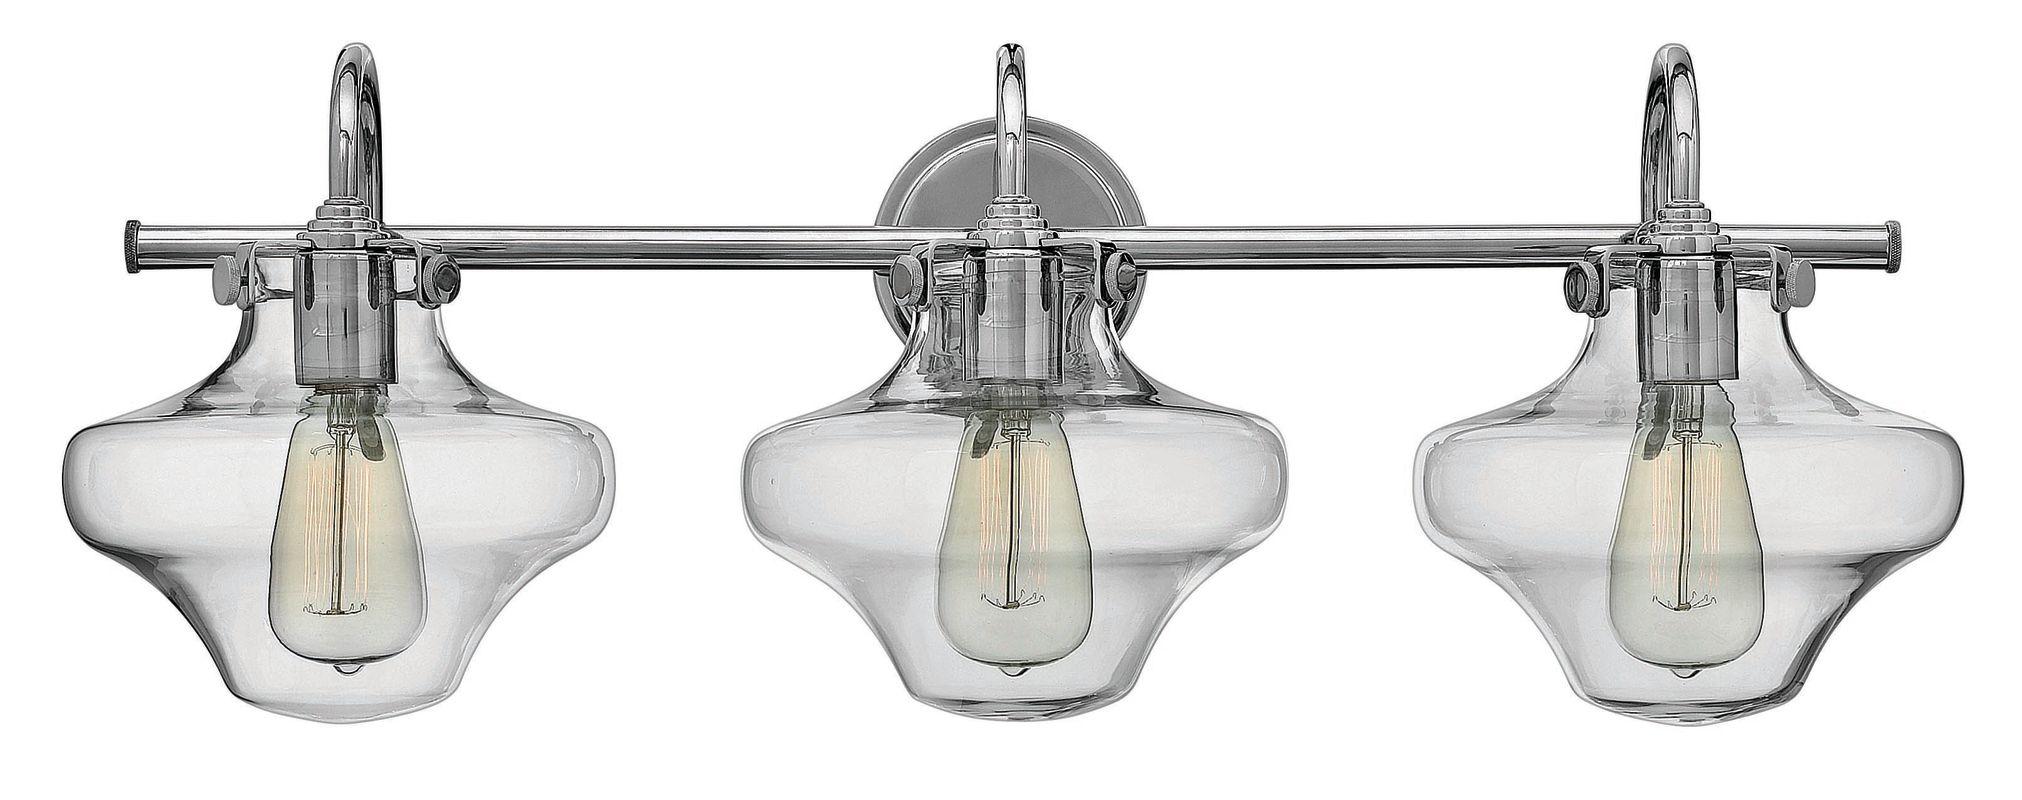 Hinkley Lighting 50031CM Chrome Industrial Congress Bathroom Light